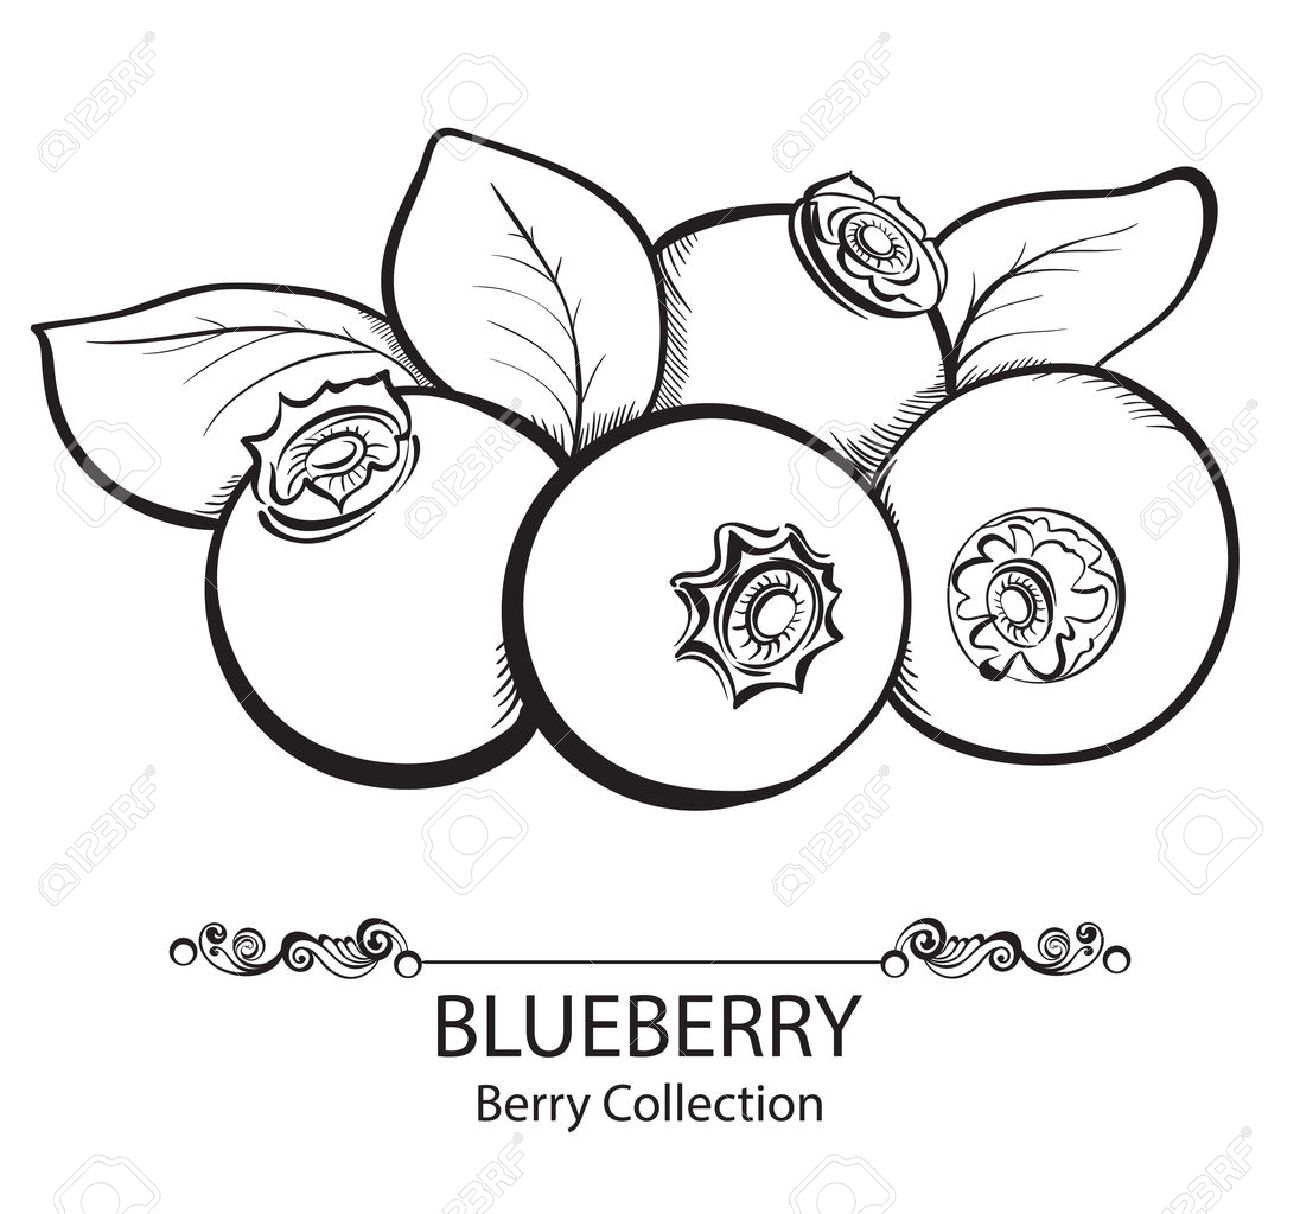 Stylized hand drawn black and white illustration of blueberry - 34923855